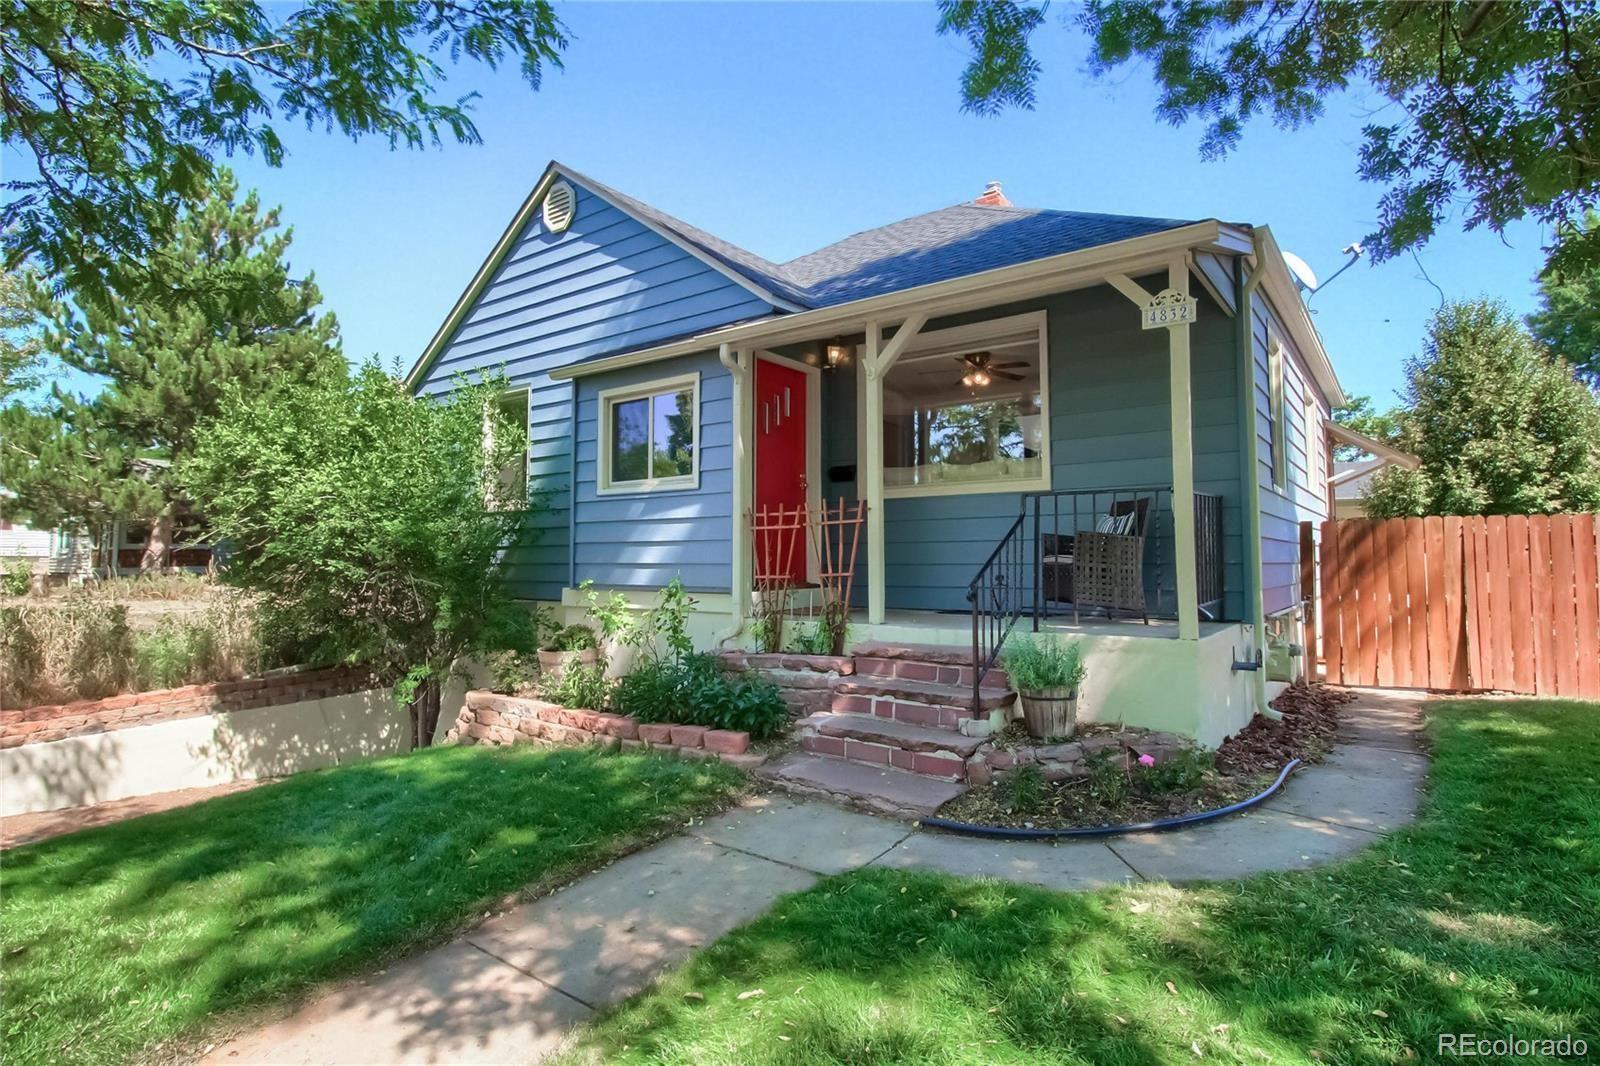 Photo of 4832 Osceola Street, Denver, CO 80212 (MLS # 8632275)